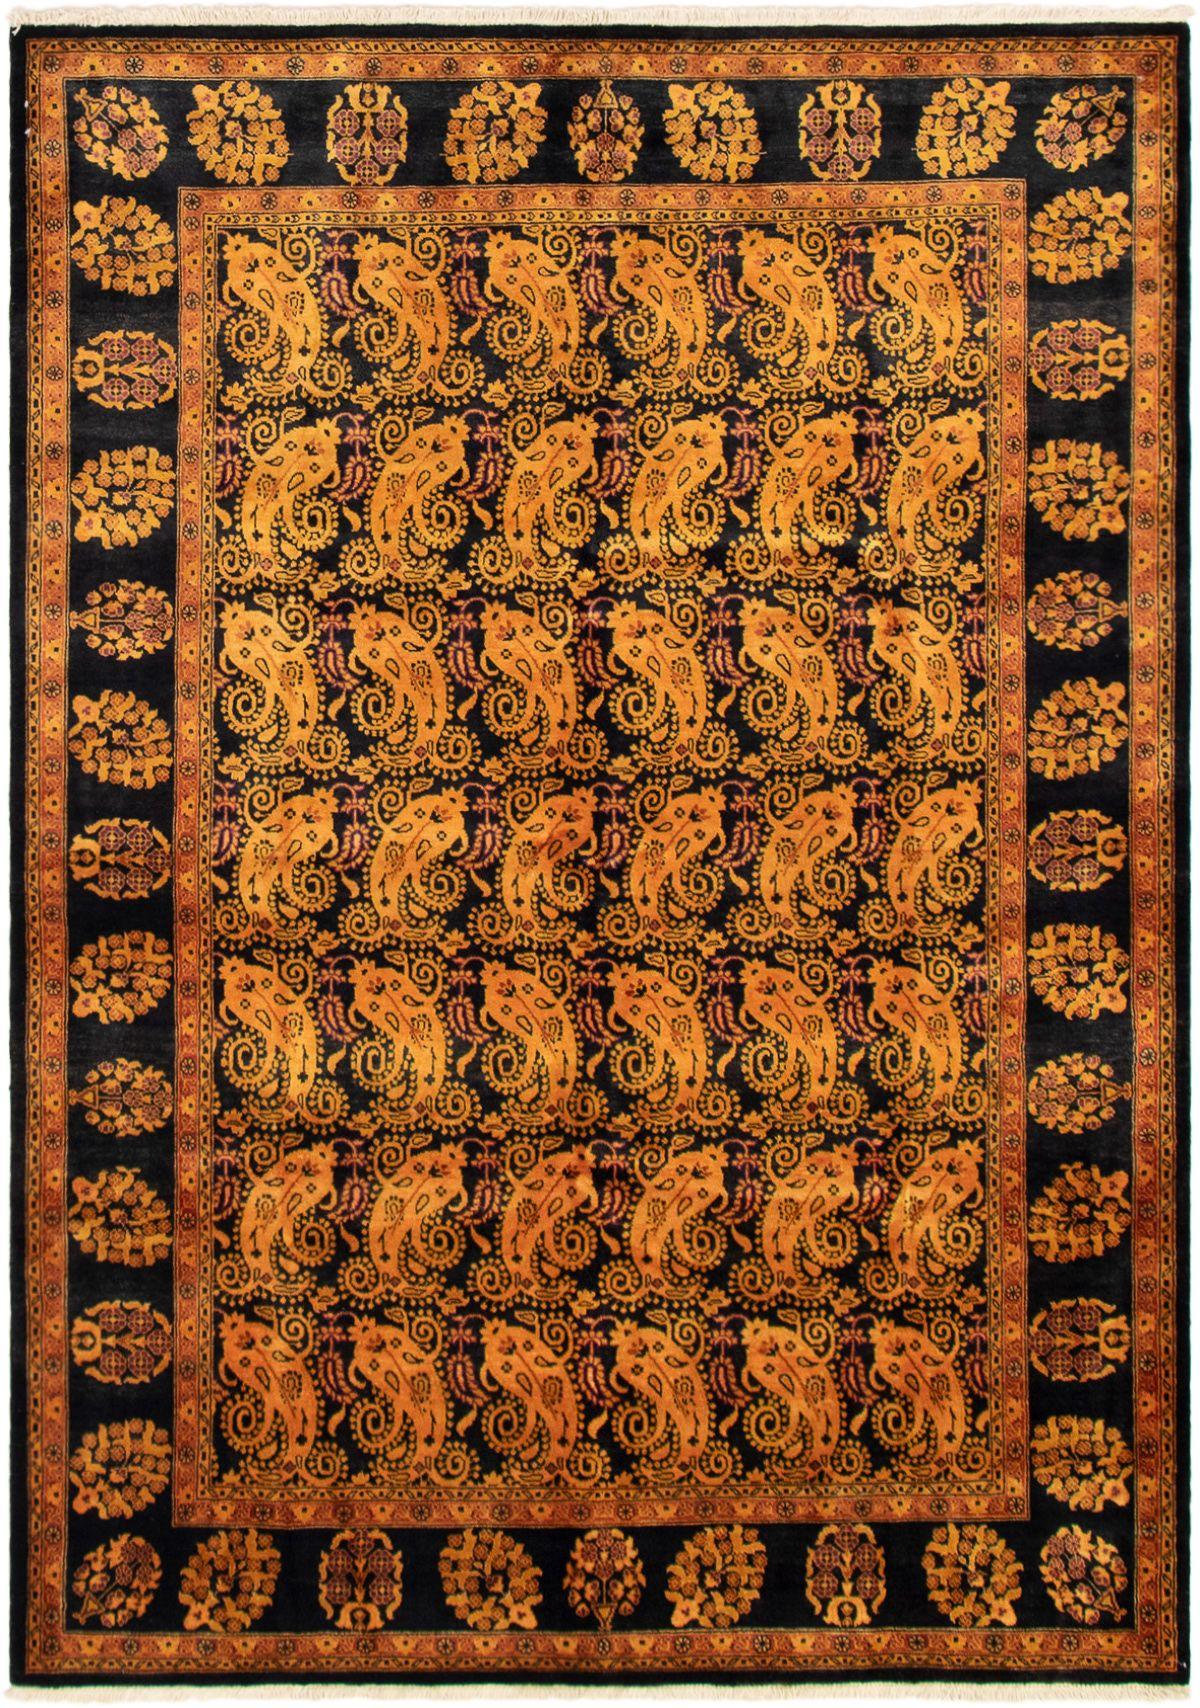 "Hand-knotted Peshawar Finest Light Orange Wool Rug 6'2"" x 8'8"" Size: 6'2"" x 8'8"""